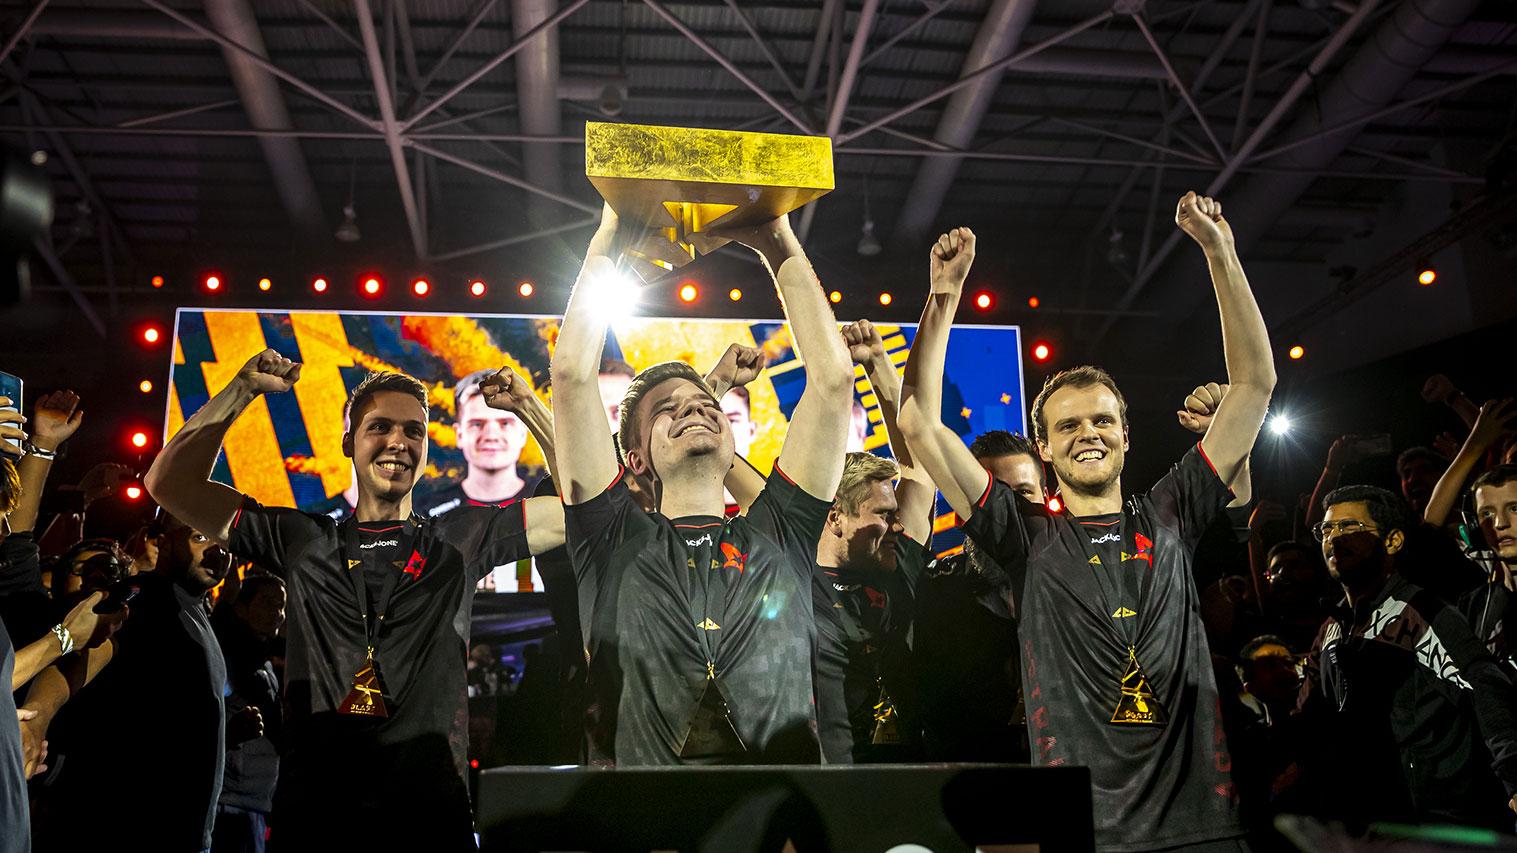 Astralis lifts BLAST Global Finals trophy